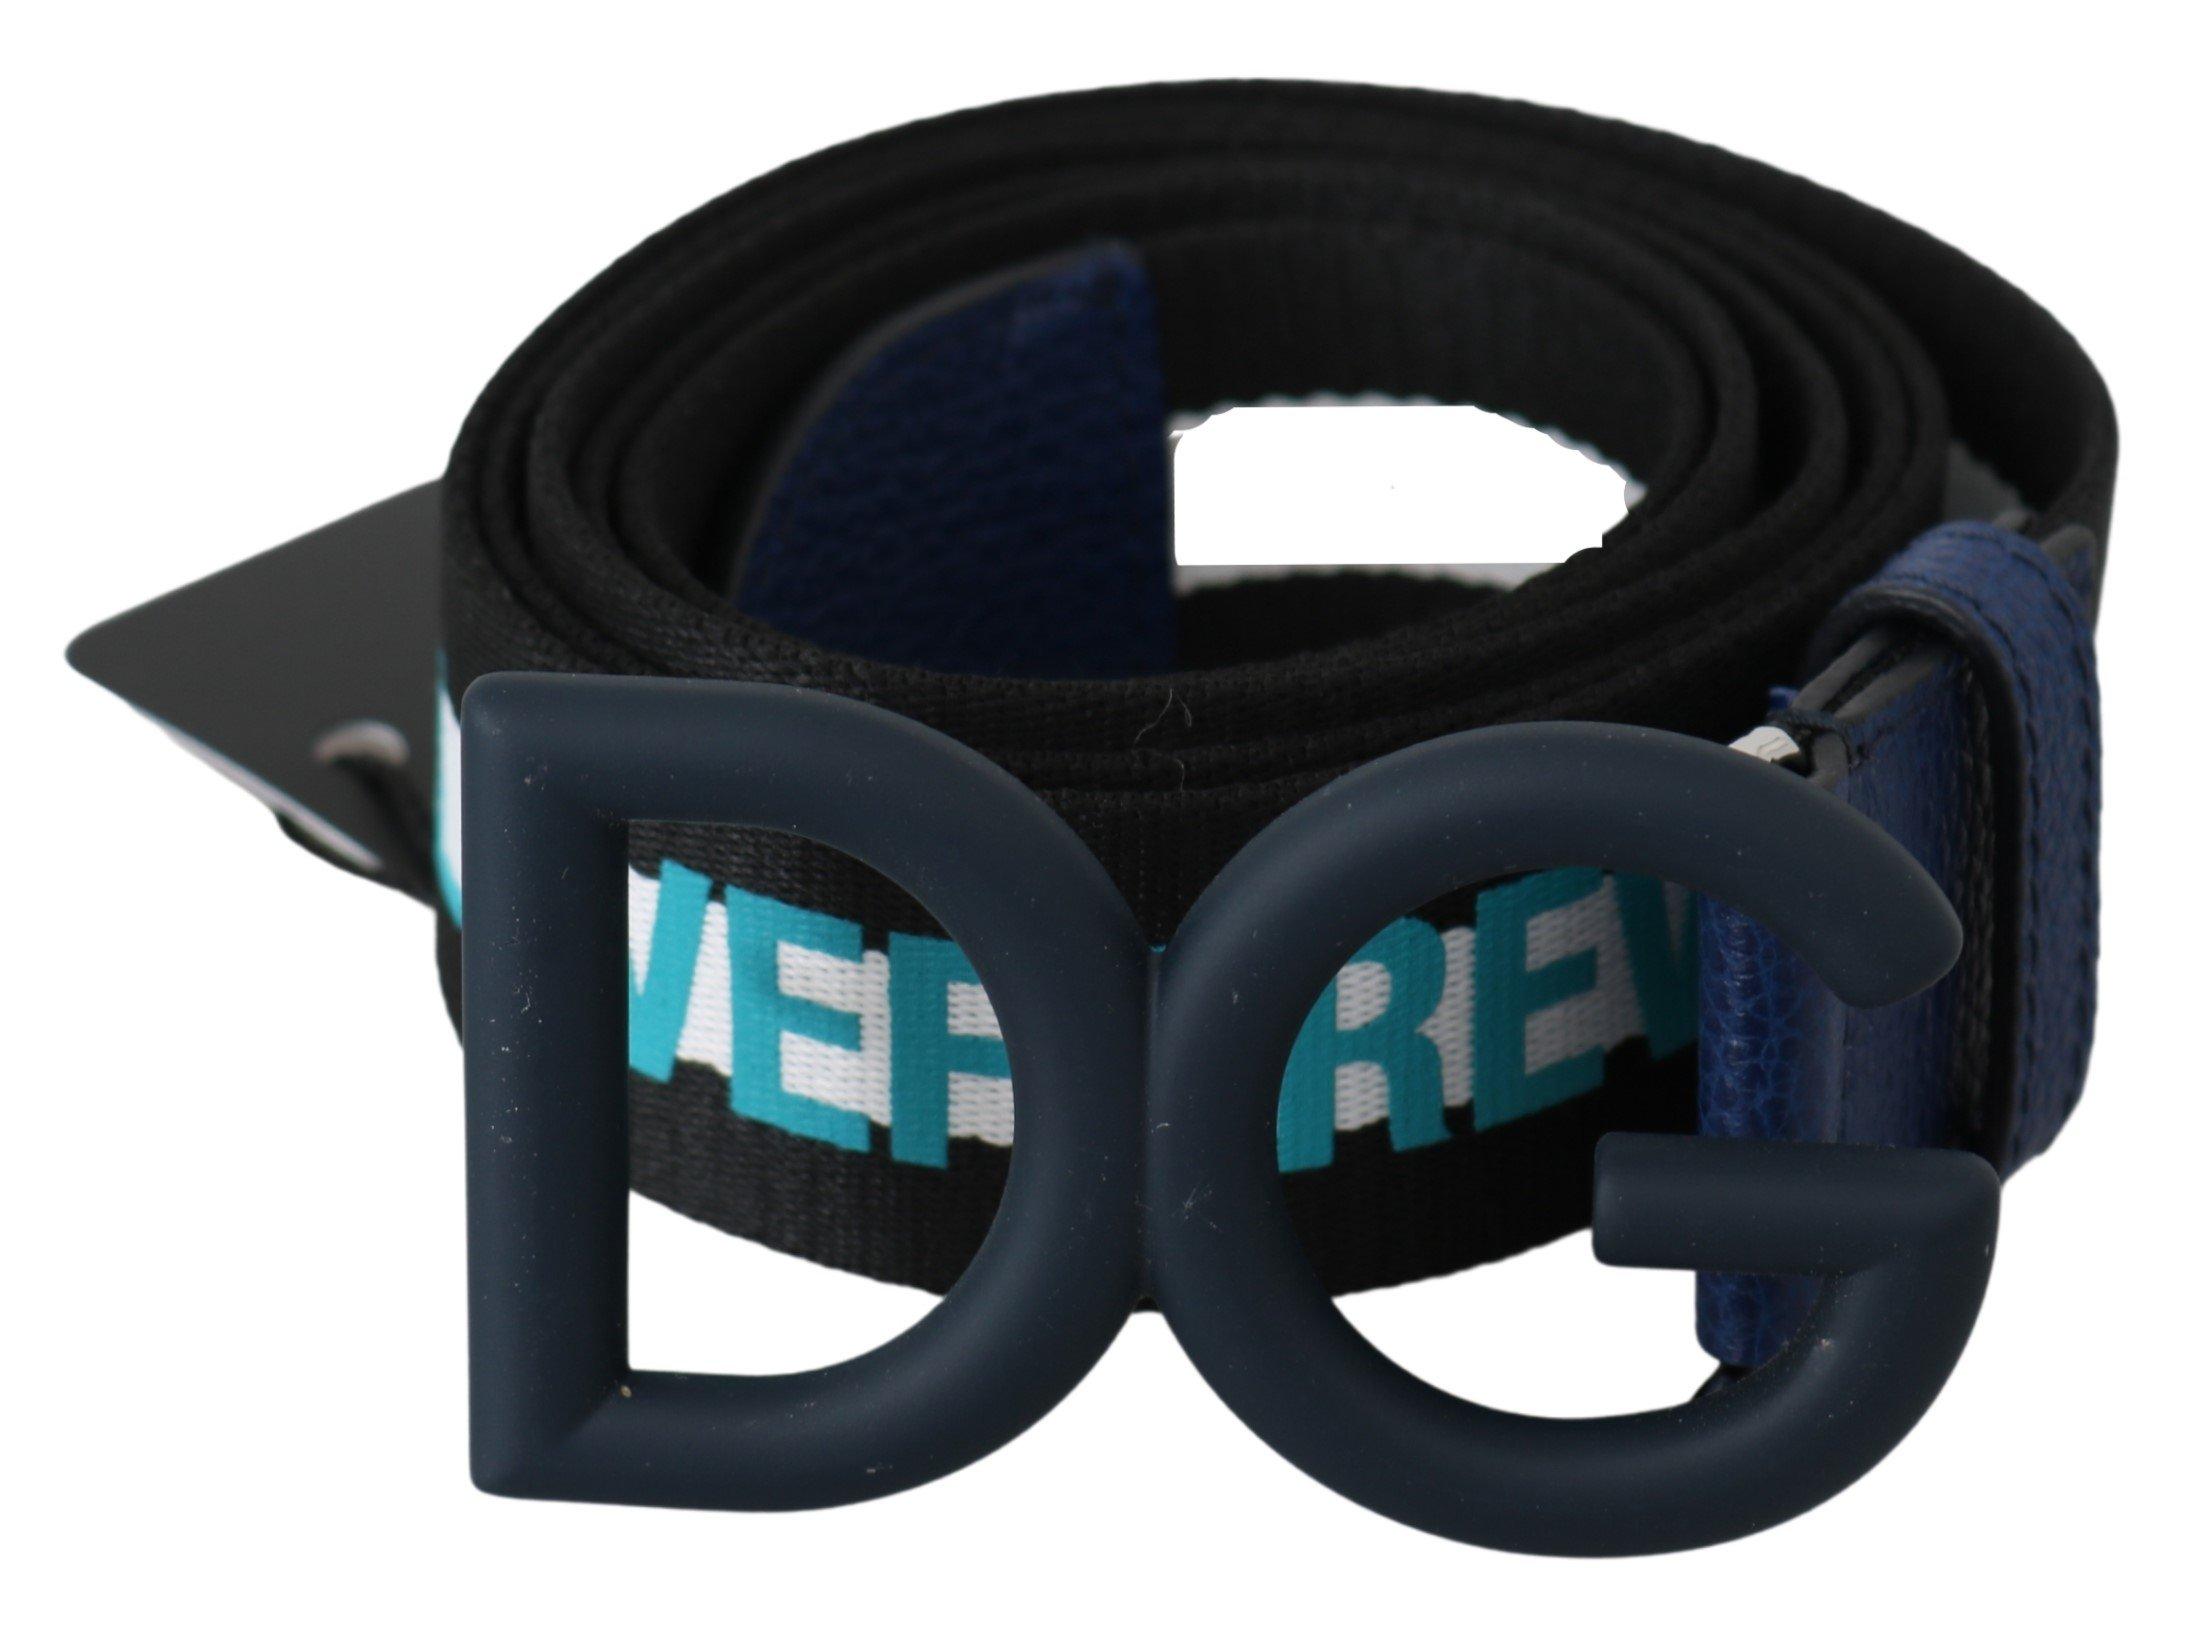 Dolce & Gabbana Men's Textile DG Logo Buckle Belt Blue BEL60499 - 100 cm / 40 Inches